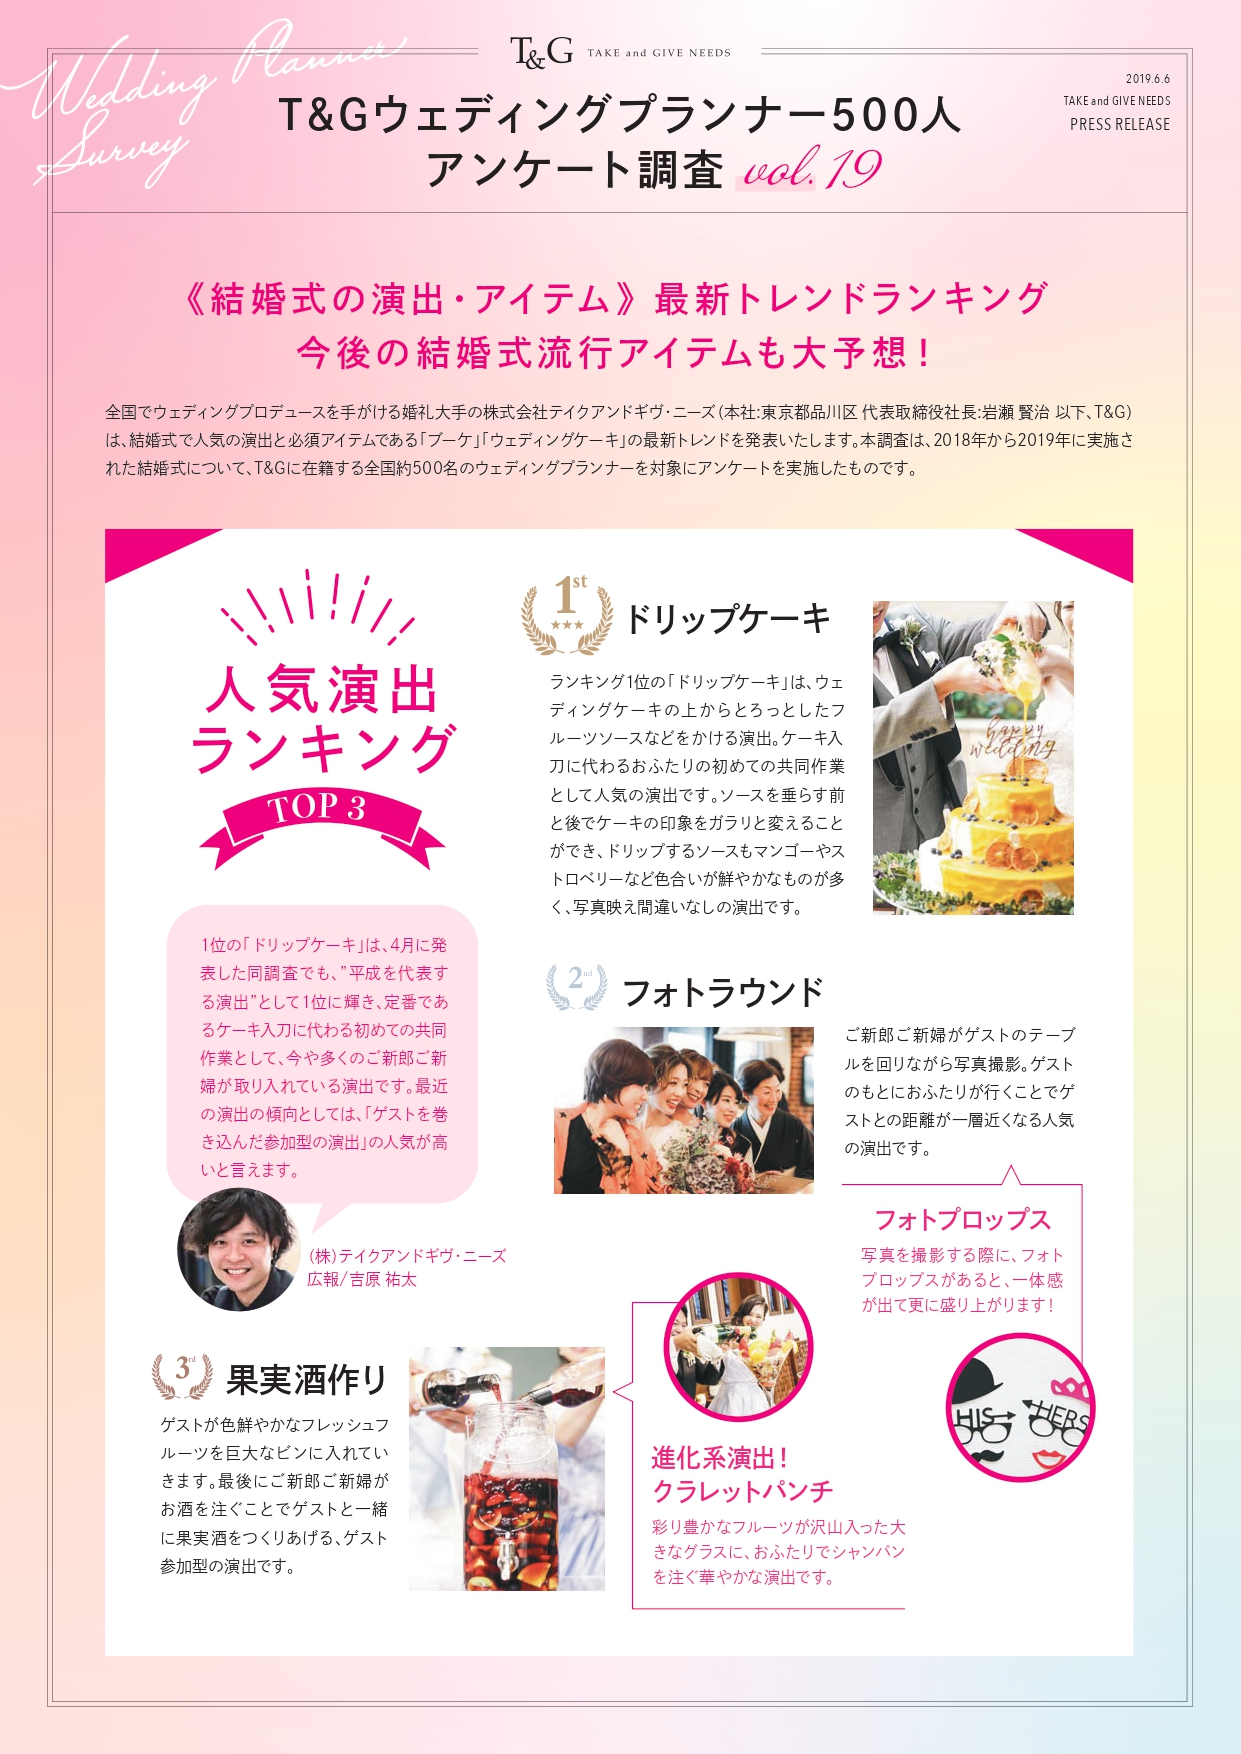 【TOPIX】T&Gウェディングプランナー500人アンケート調査Vol.19『結婚式の人気演出・アイテム』を発表